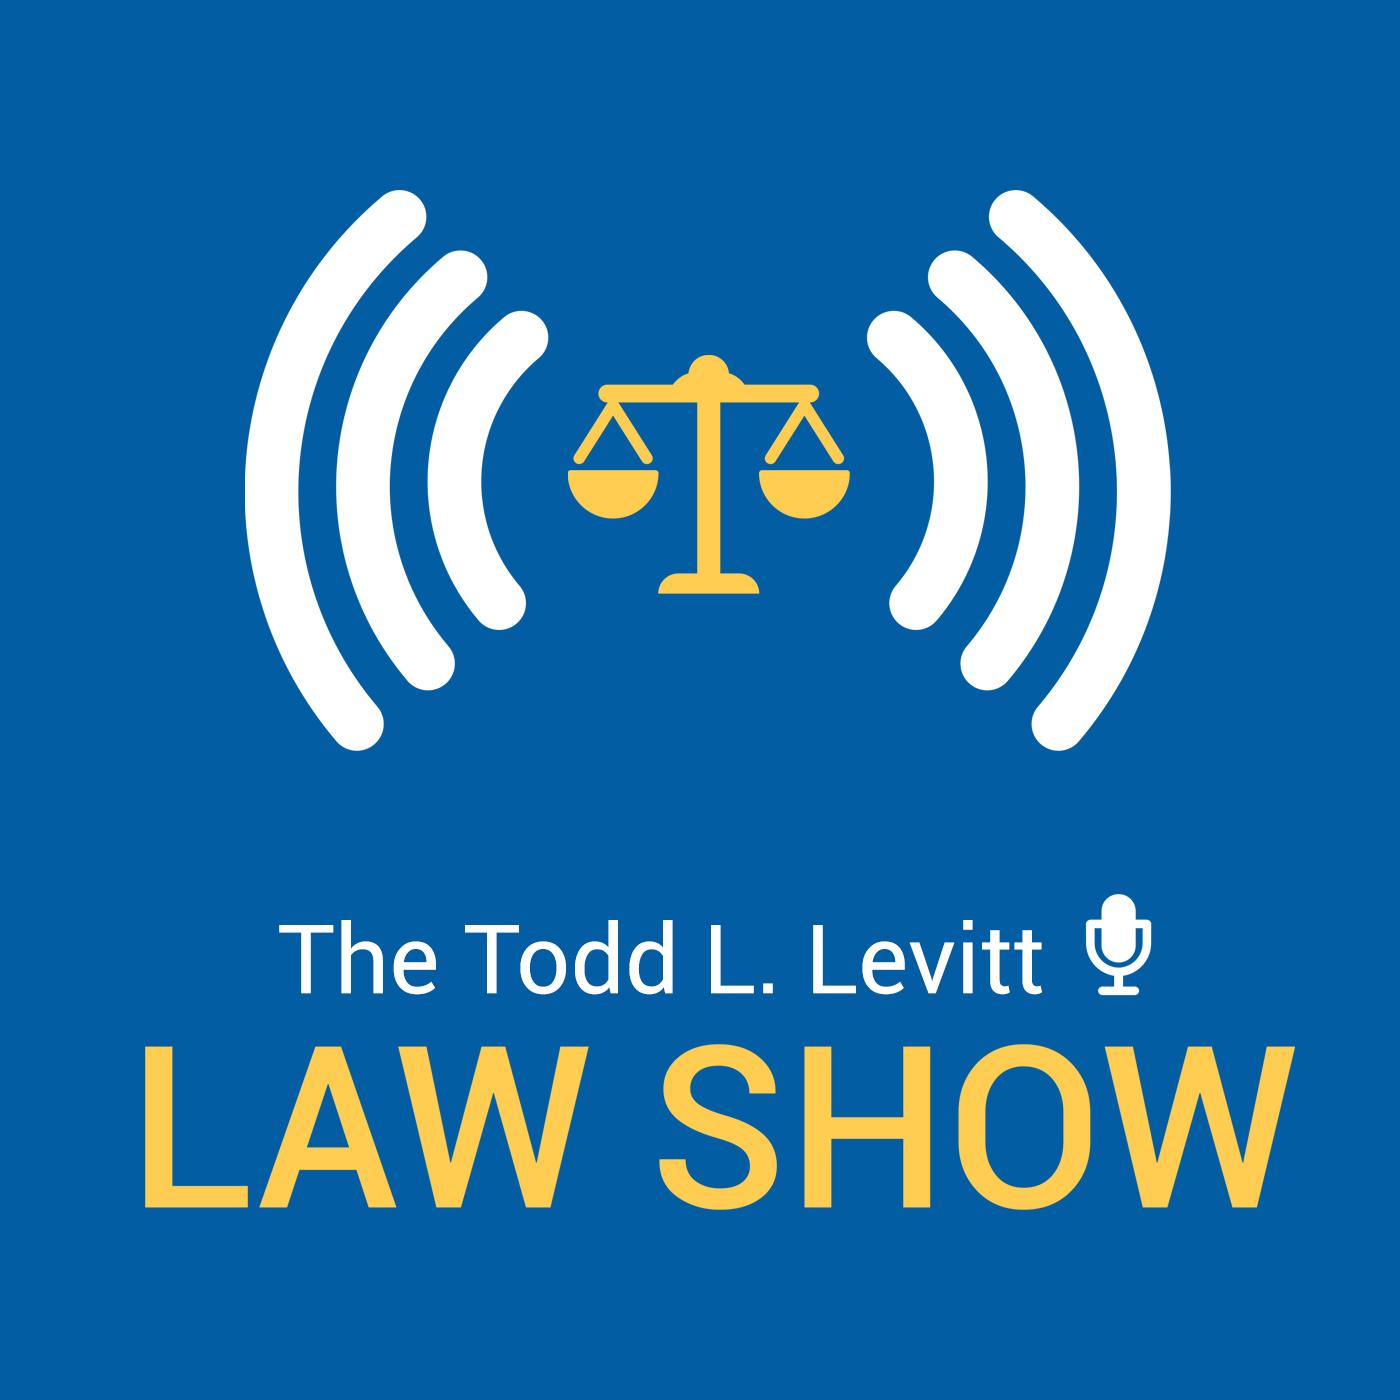 The Todd L. Levitt Law Show